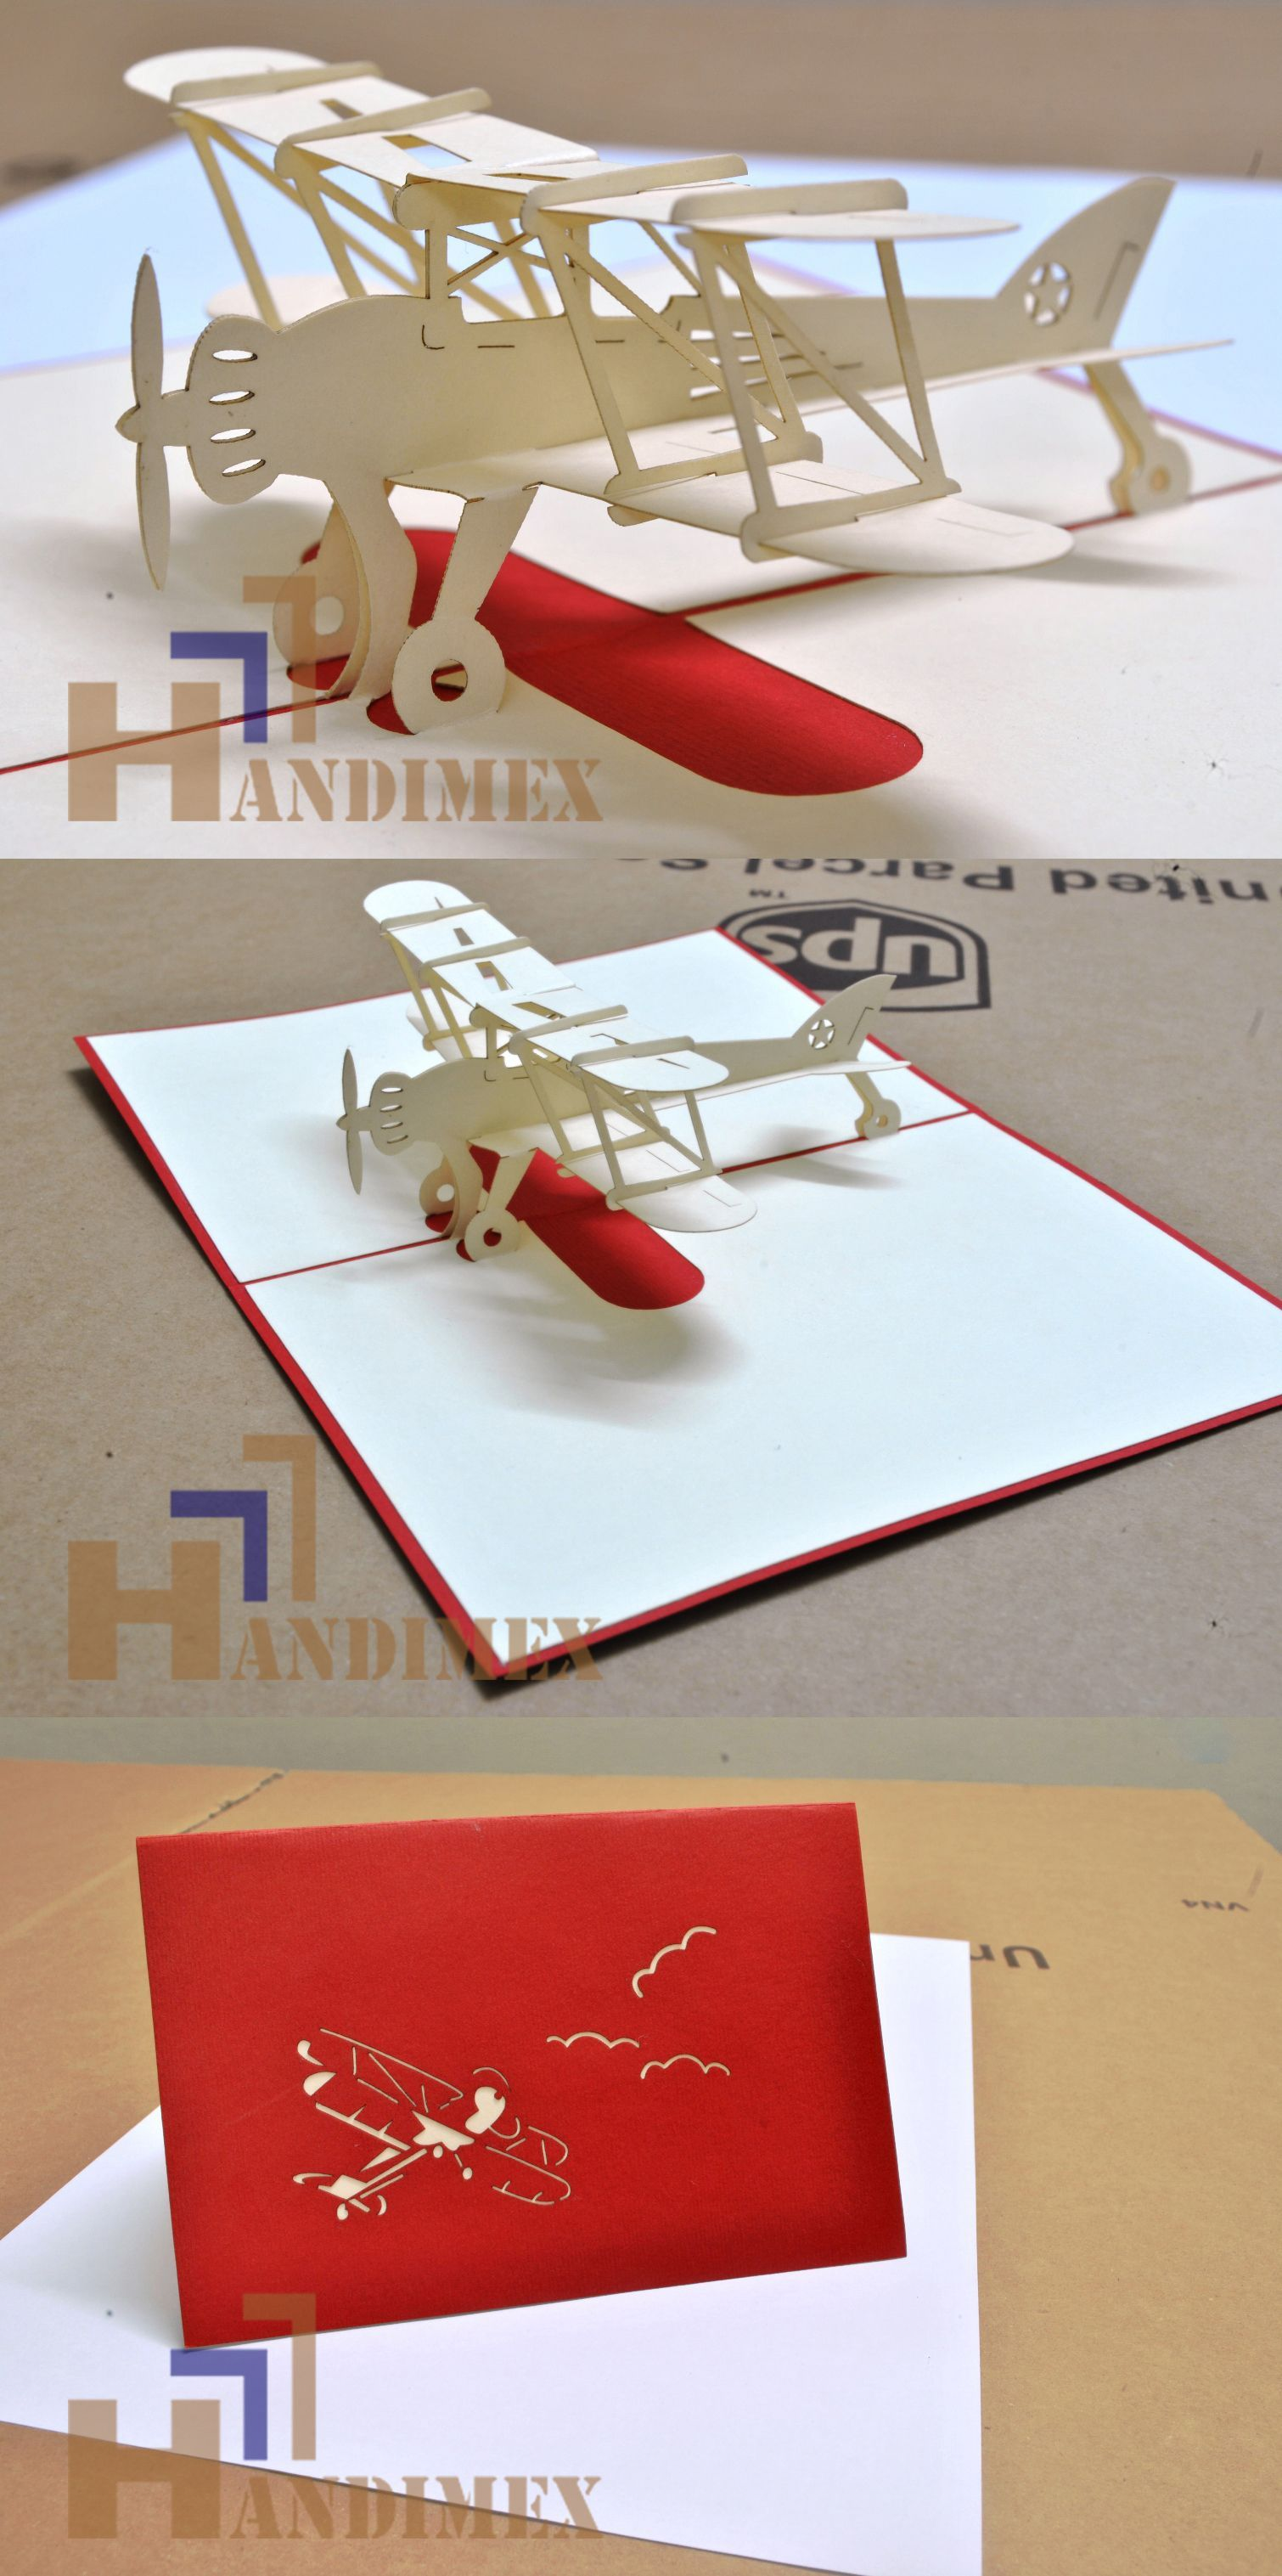 Model Fs012 Http Handimex Vietnam Com Pop Up Card Diy Pop Up Cards Pop Up Cards Pop Up Box Cards